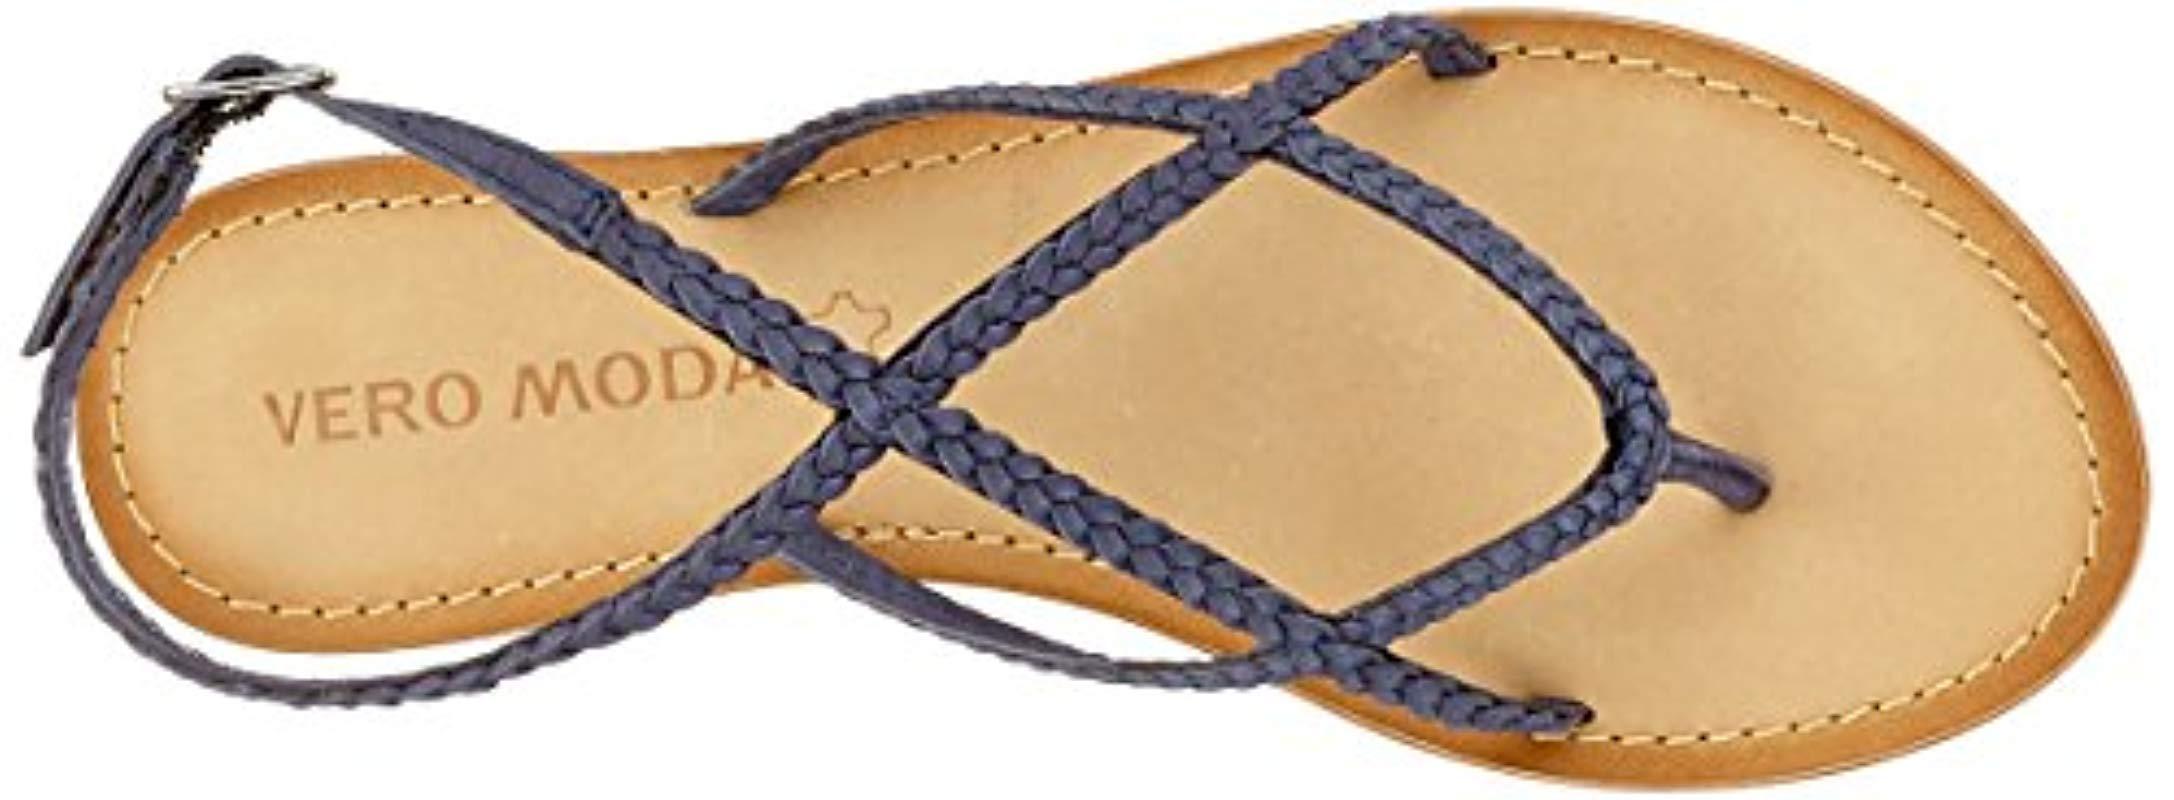 e172a5c0997 Vero Moda Vmbeta Leather Sandal Ankle Strap in Blue - Lyst